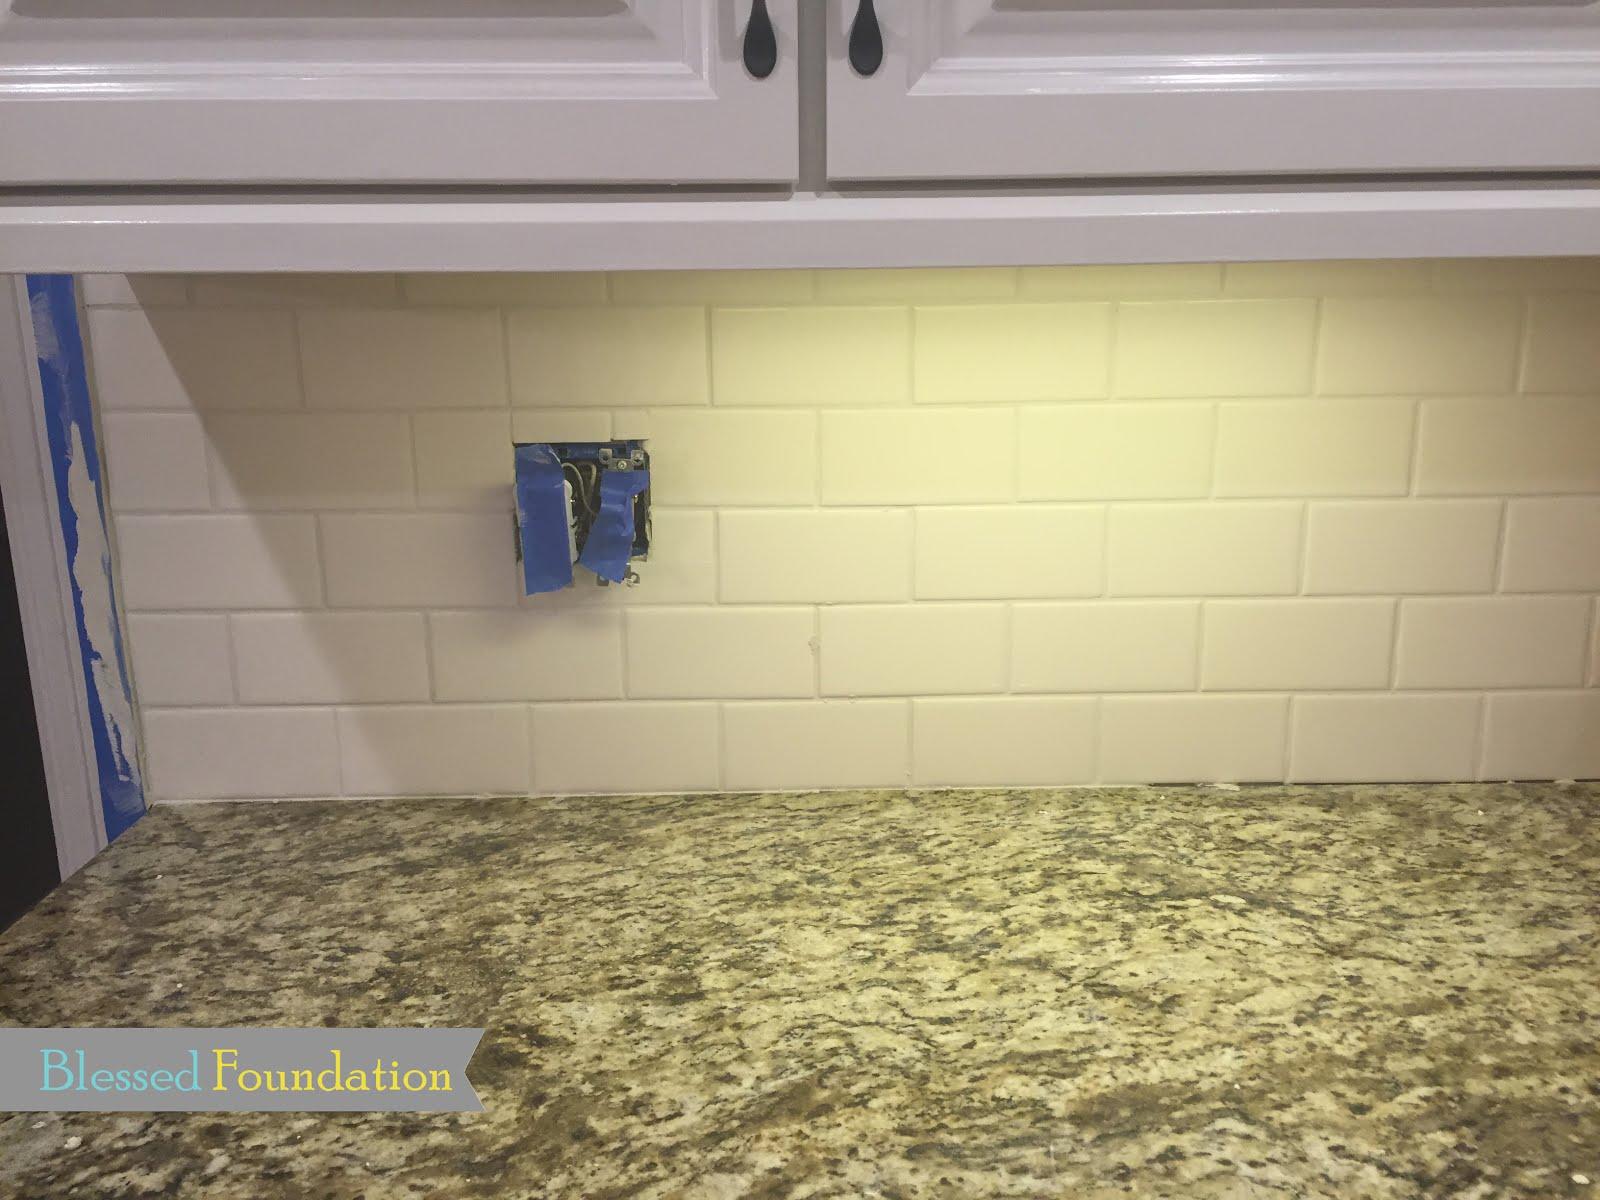 blessed foundation post 41 kitchen backsplash step 8 caulk along the counter